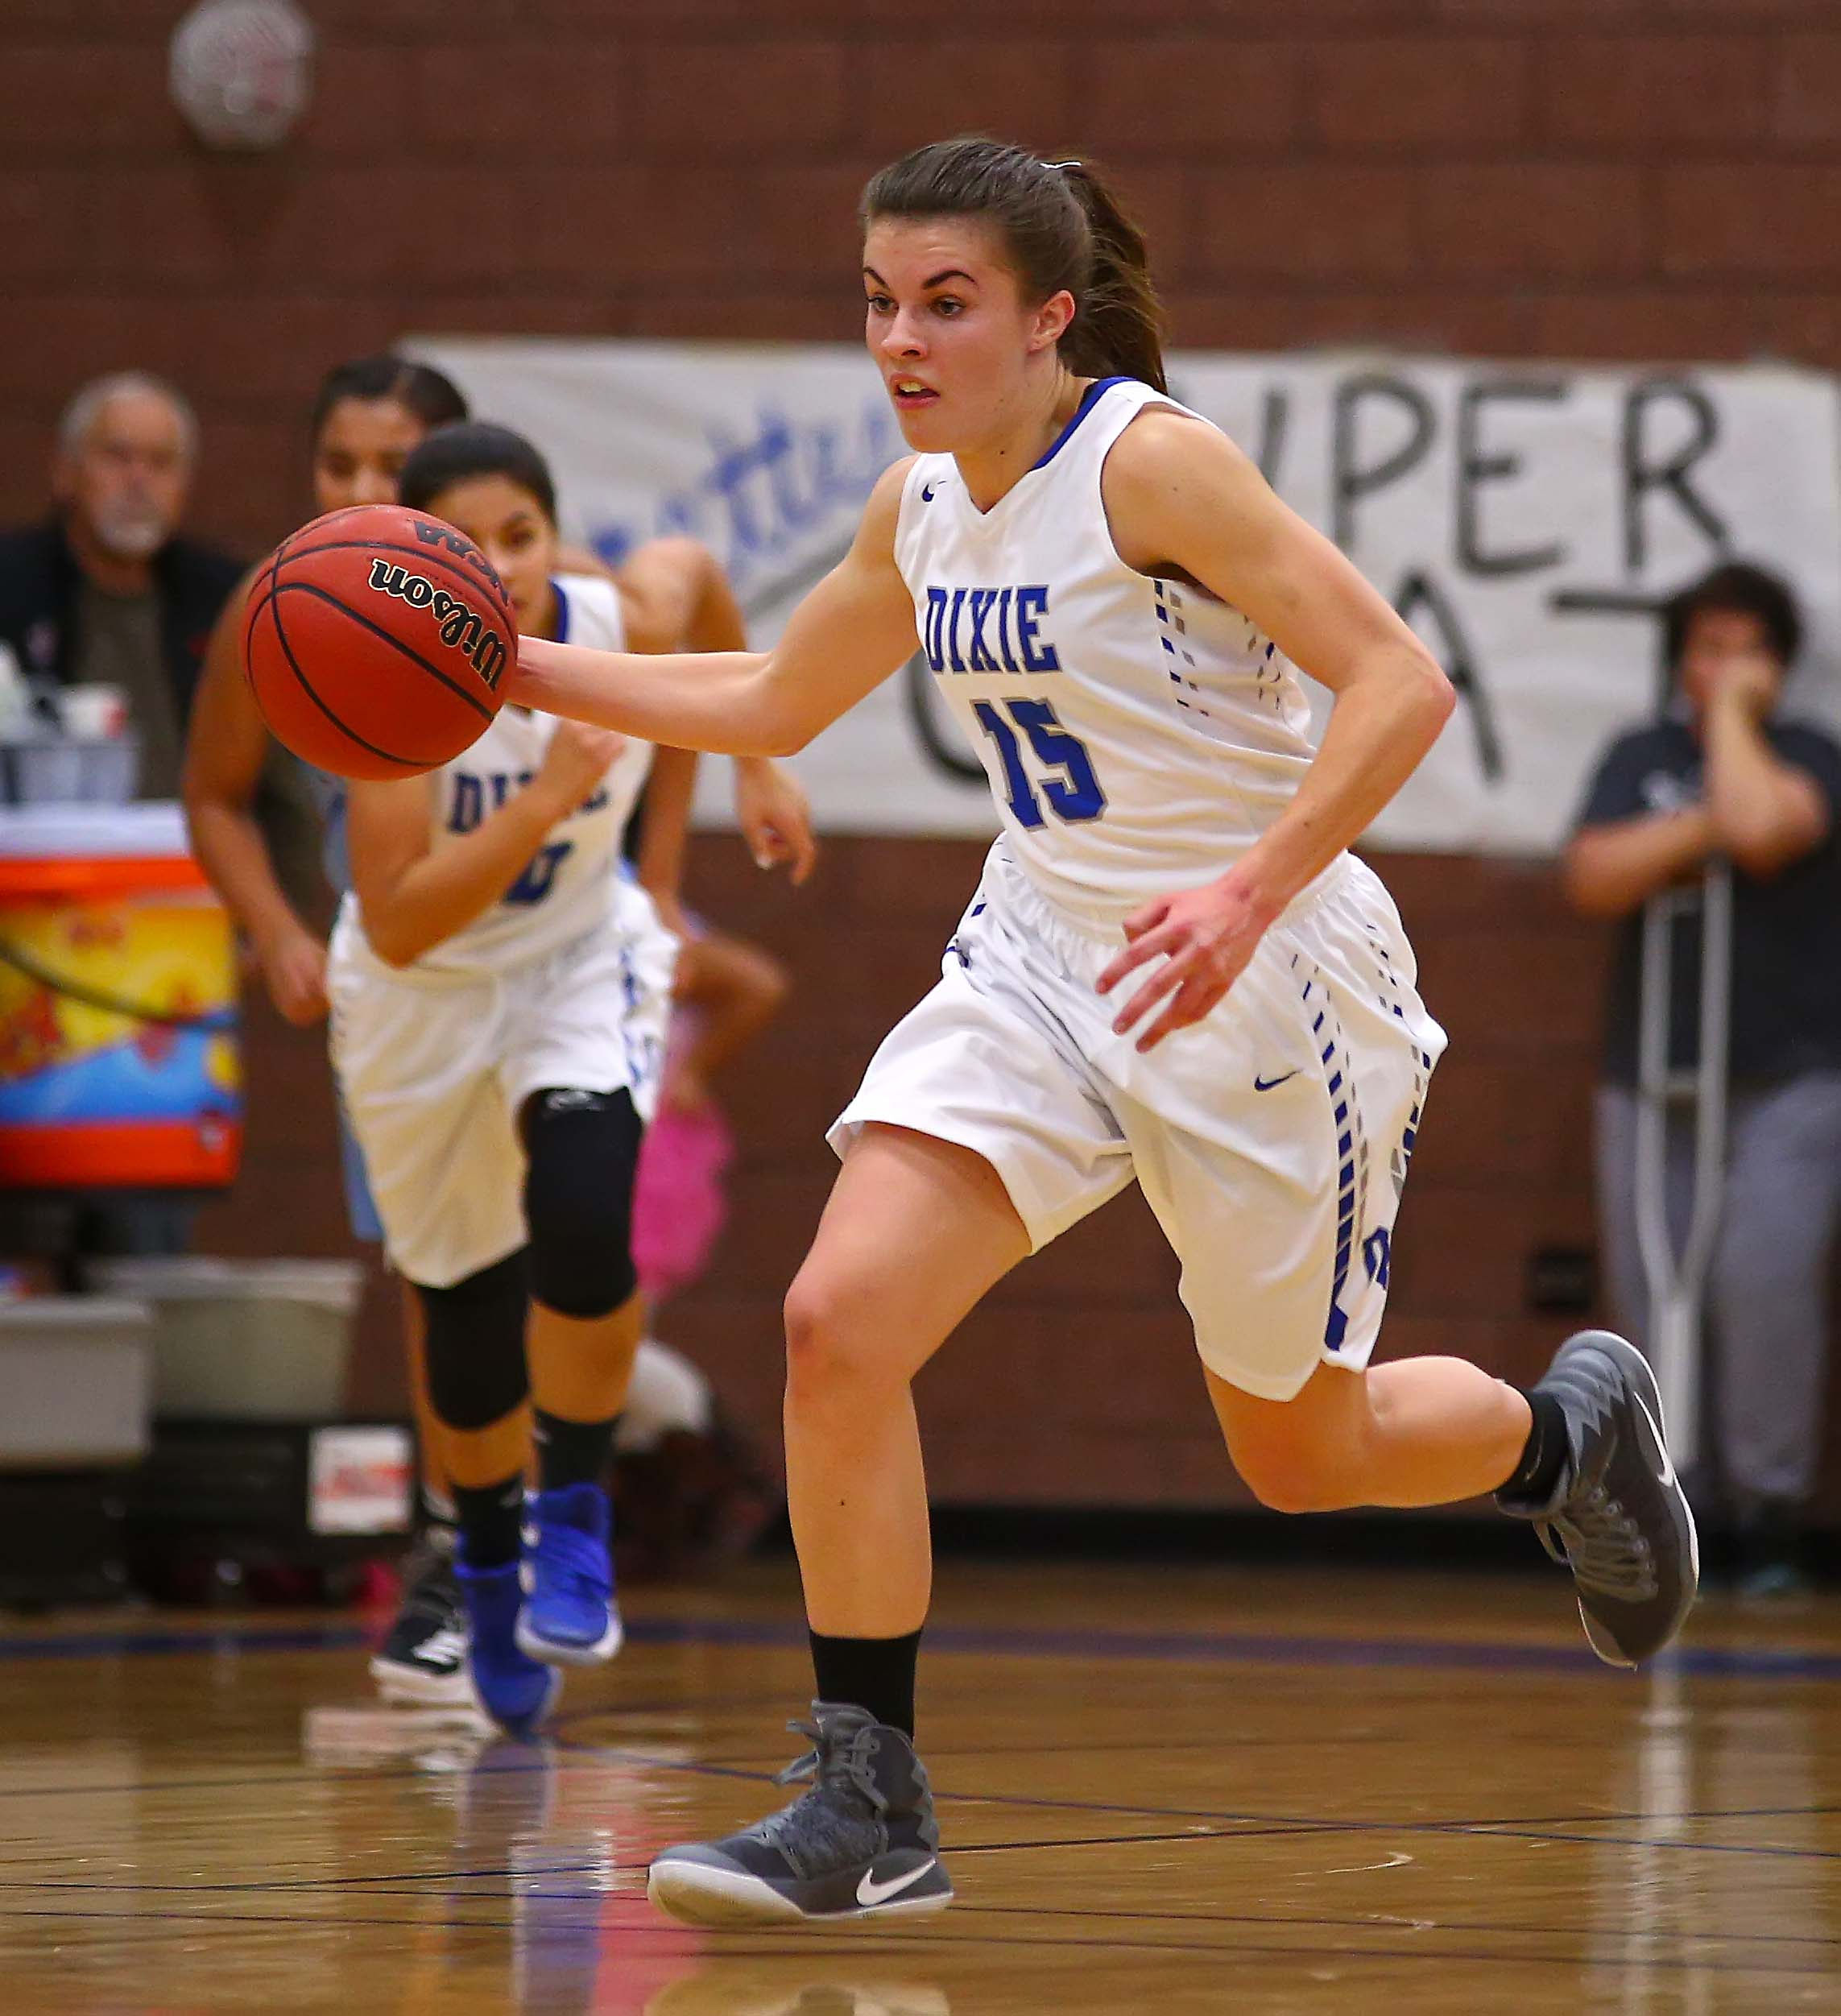 Dixie's Kelsea Barker (15), Dixie vs. Canyon View, Girls Basketball, St. George, Utah, Dec. 20, 2016, | Photo by Robert Hoppie, ASPpix.com, St. George News